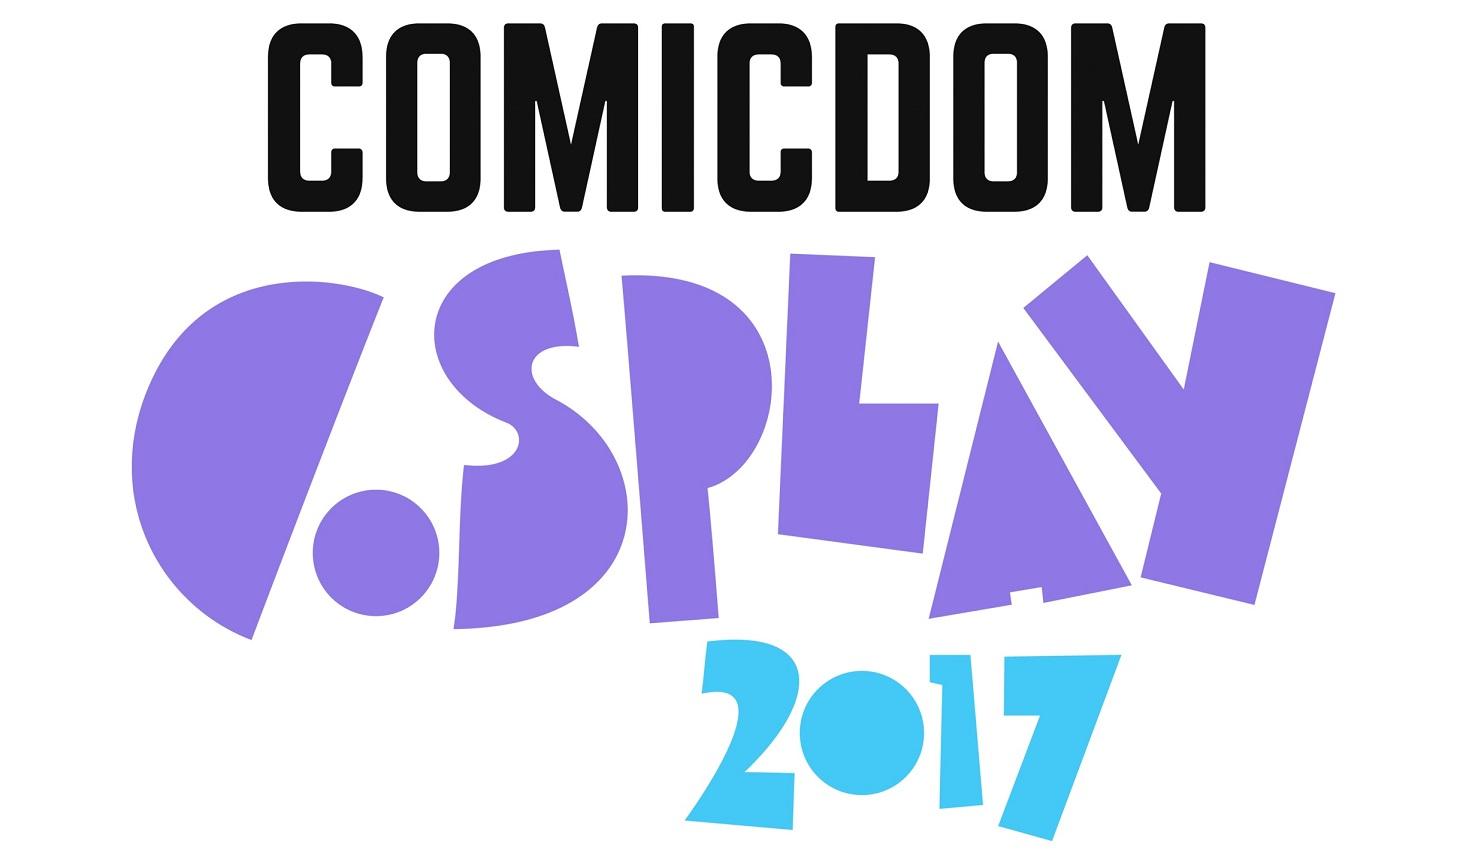 Comicdom Cosplay 2017